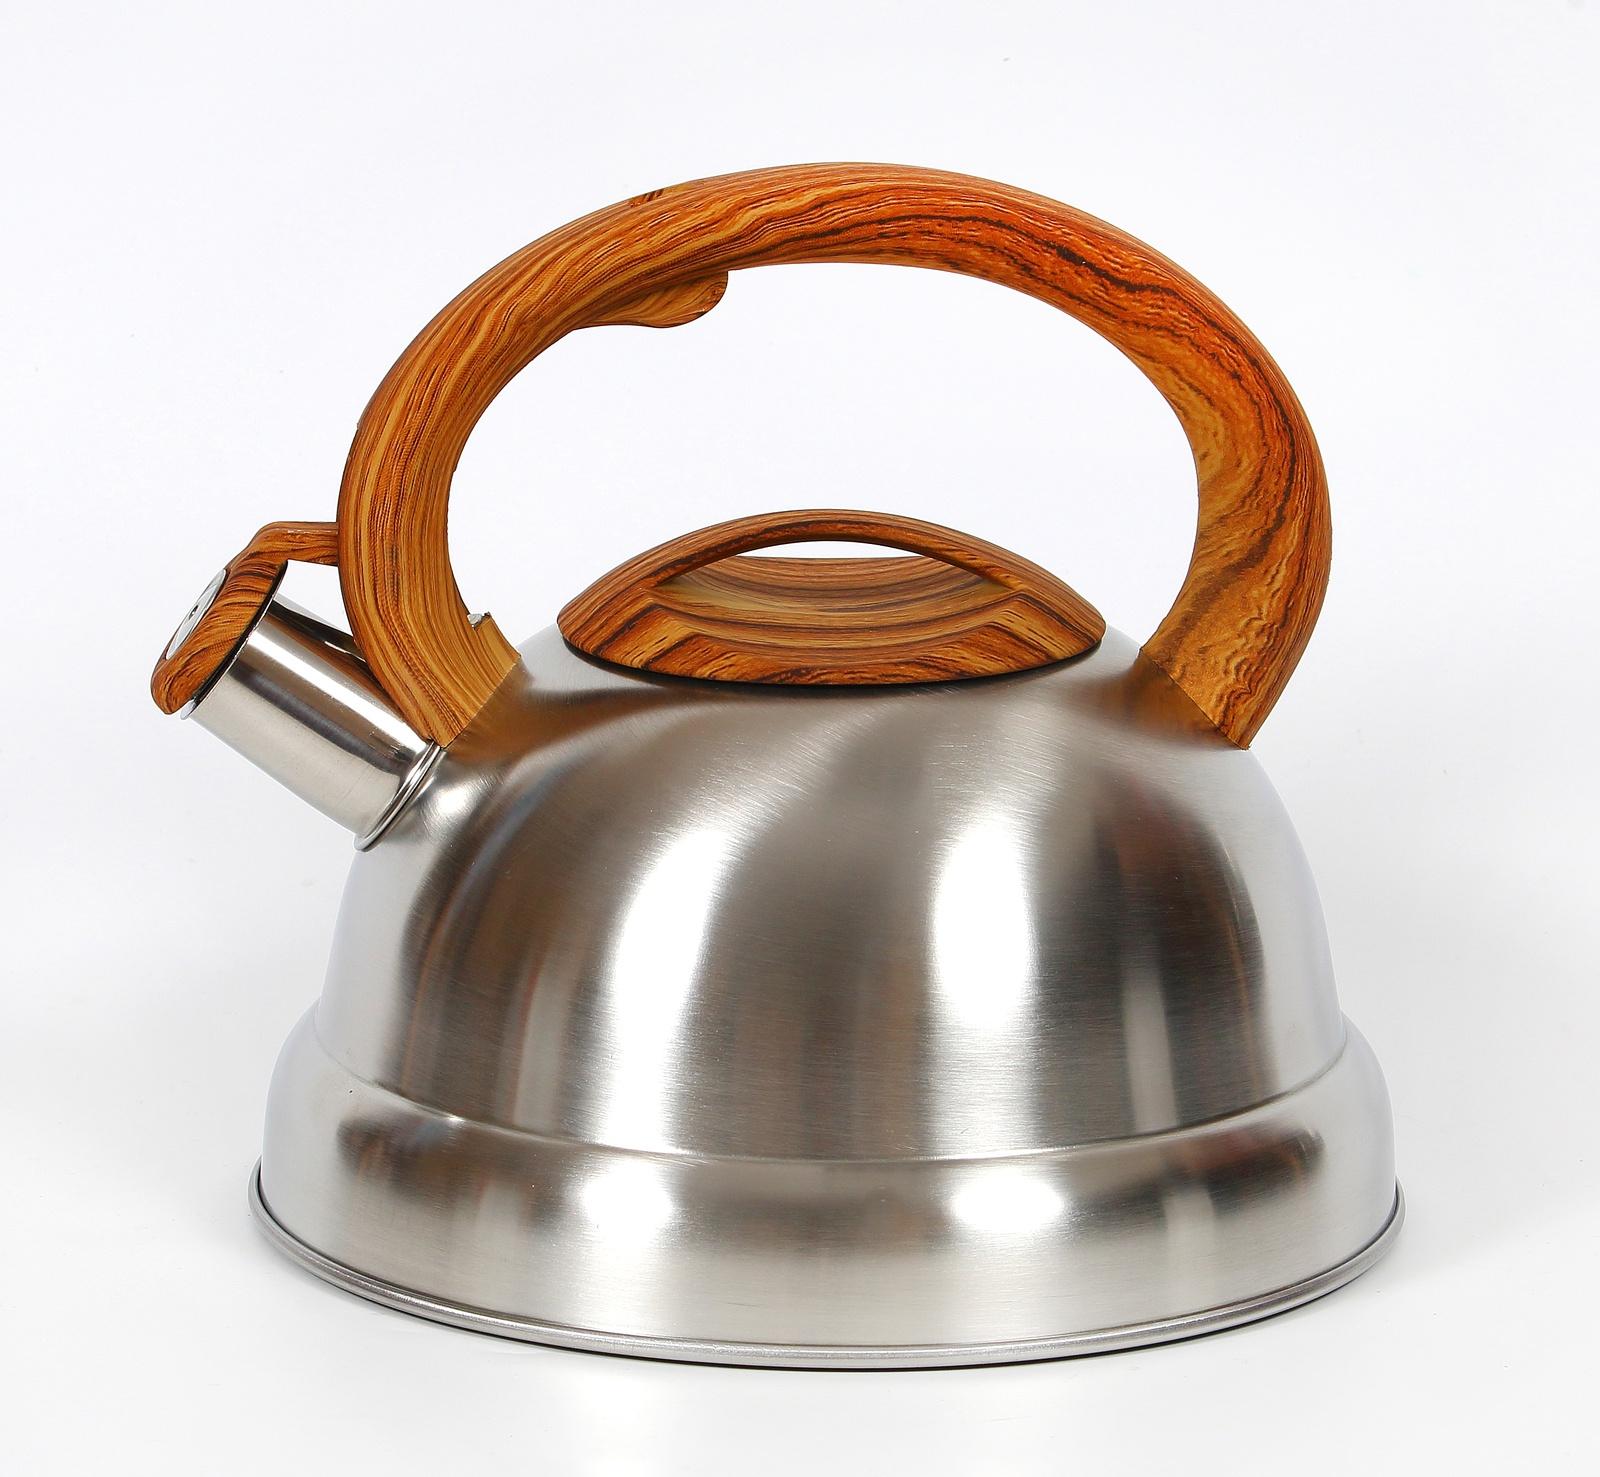 Чайник КС со свистком, 333-RY-9, металлический, коричневый, 3 л чайник кмз 3 5 л коричневый